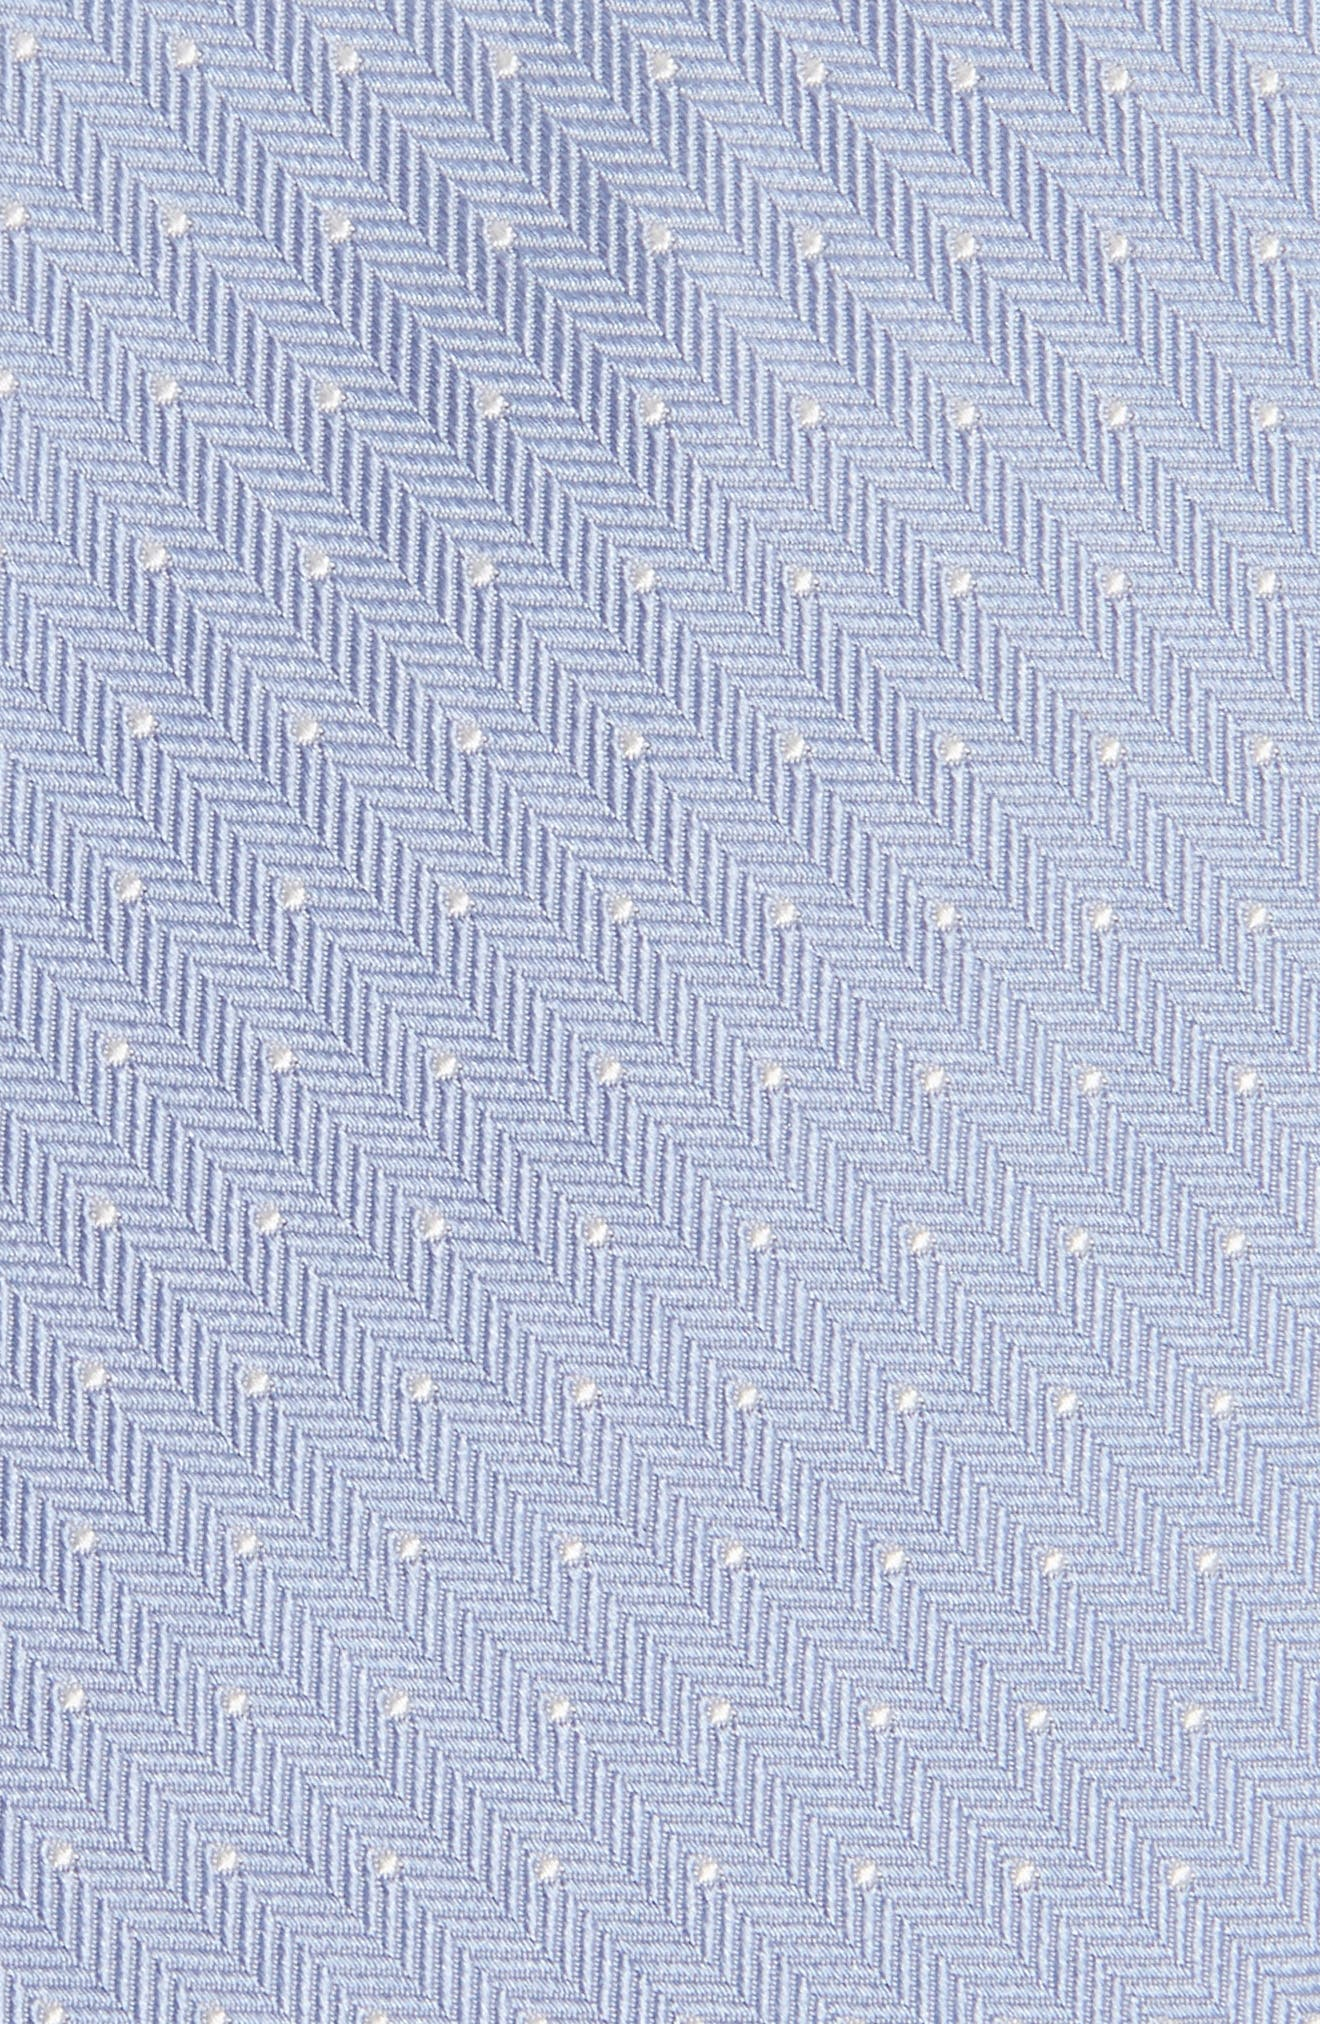 Herringbone Dot Silk Tie,                             Alternate thumbnail 2, color,                             Herringbone Dot Airy Blue